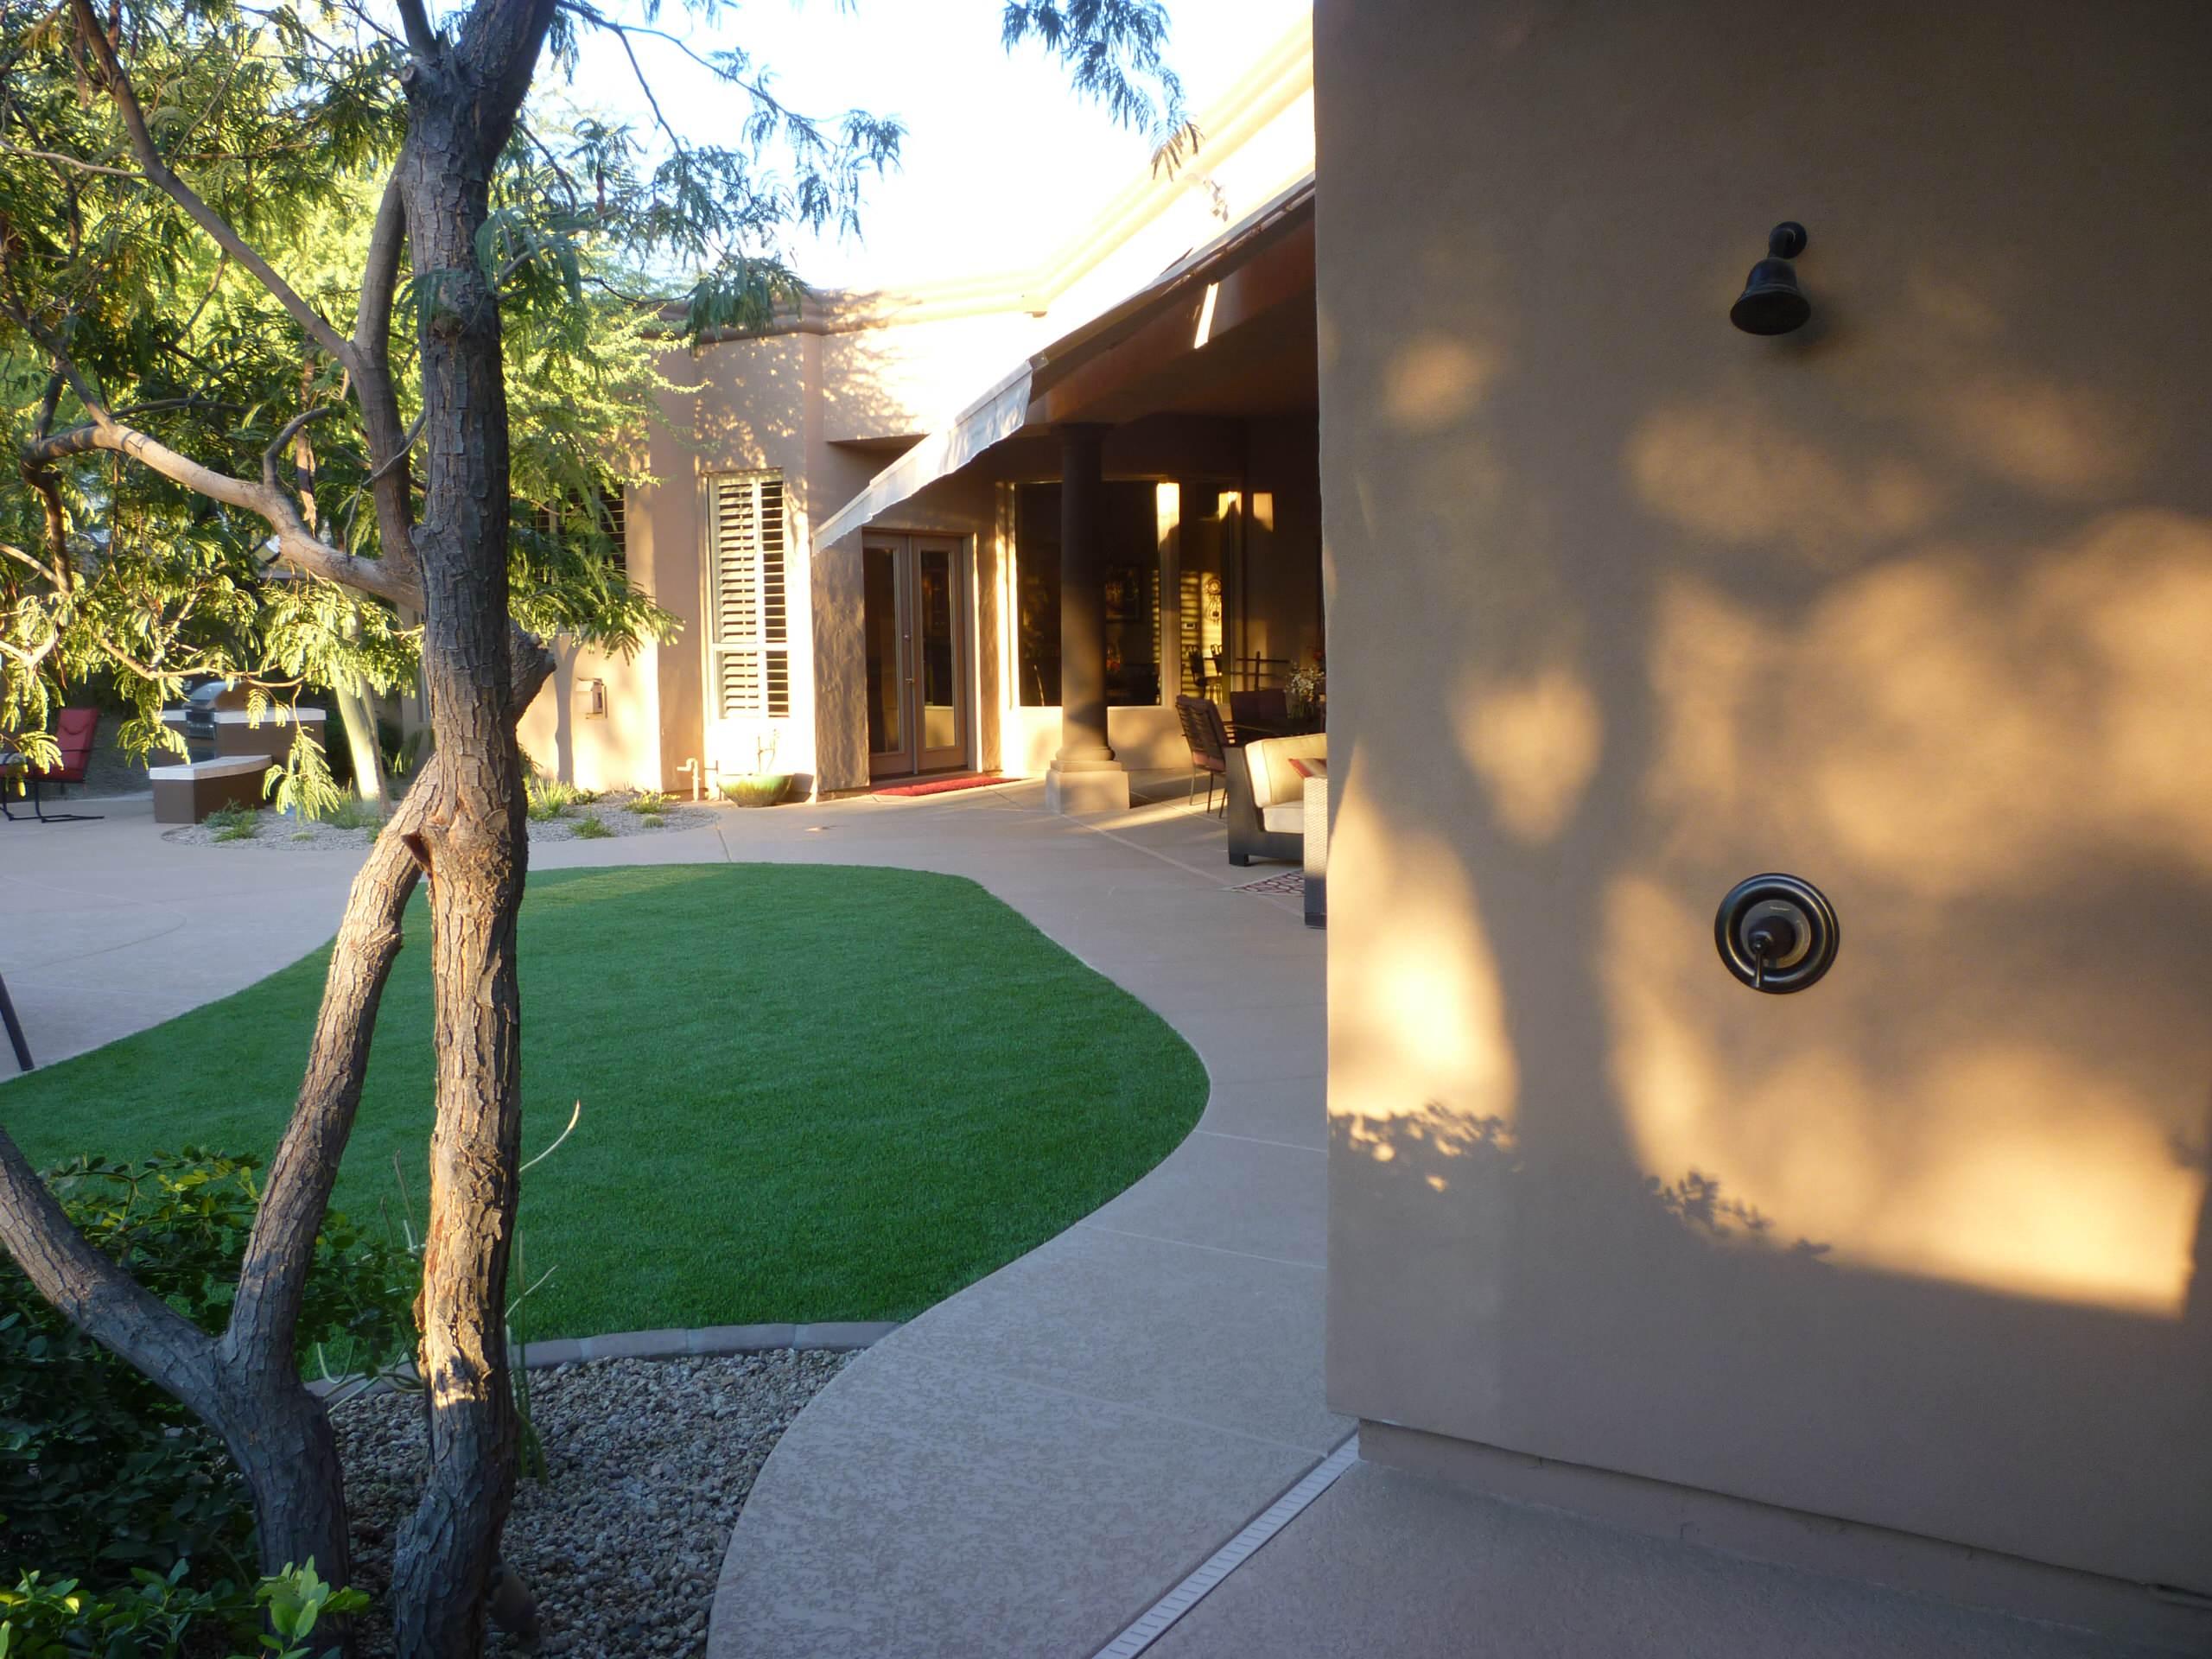 Outdoor Shower & Artificial Turf